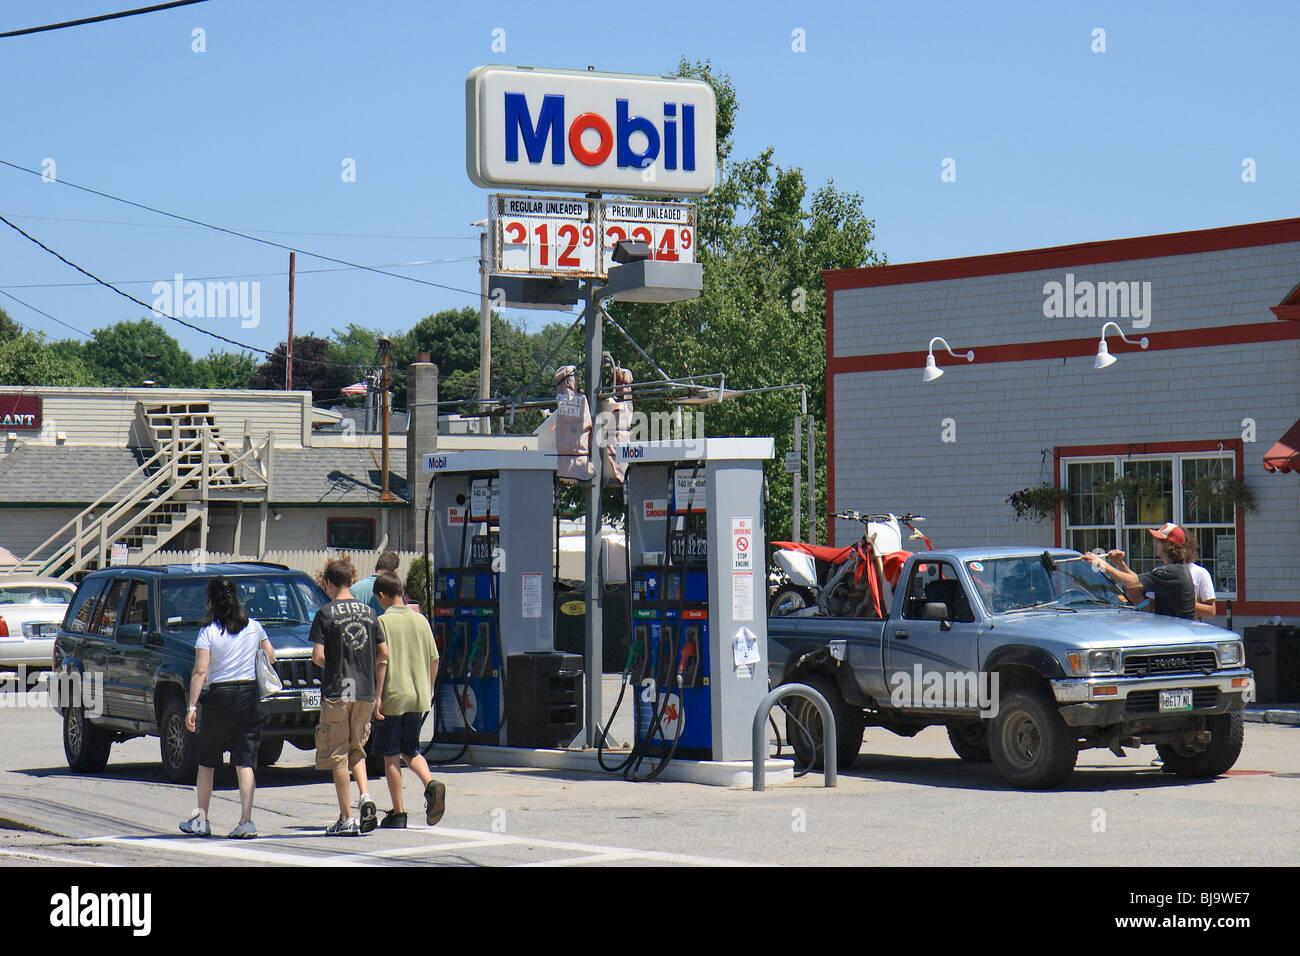 Petrol Company Stock Photos & Petrol Company Stock Images - Alamy